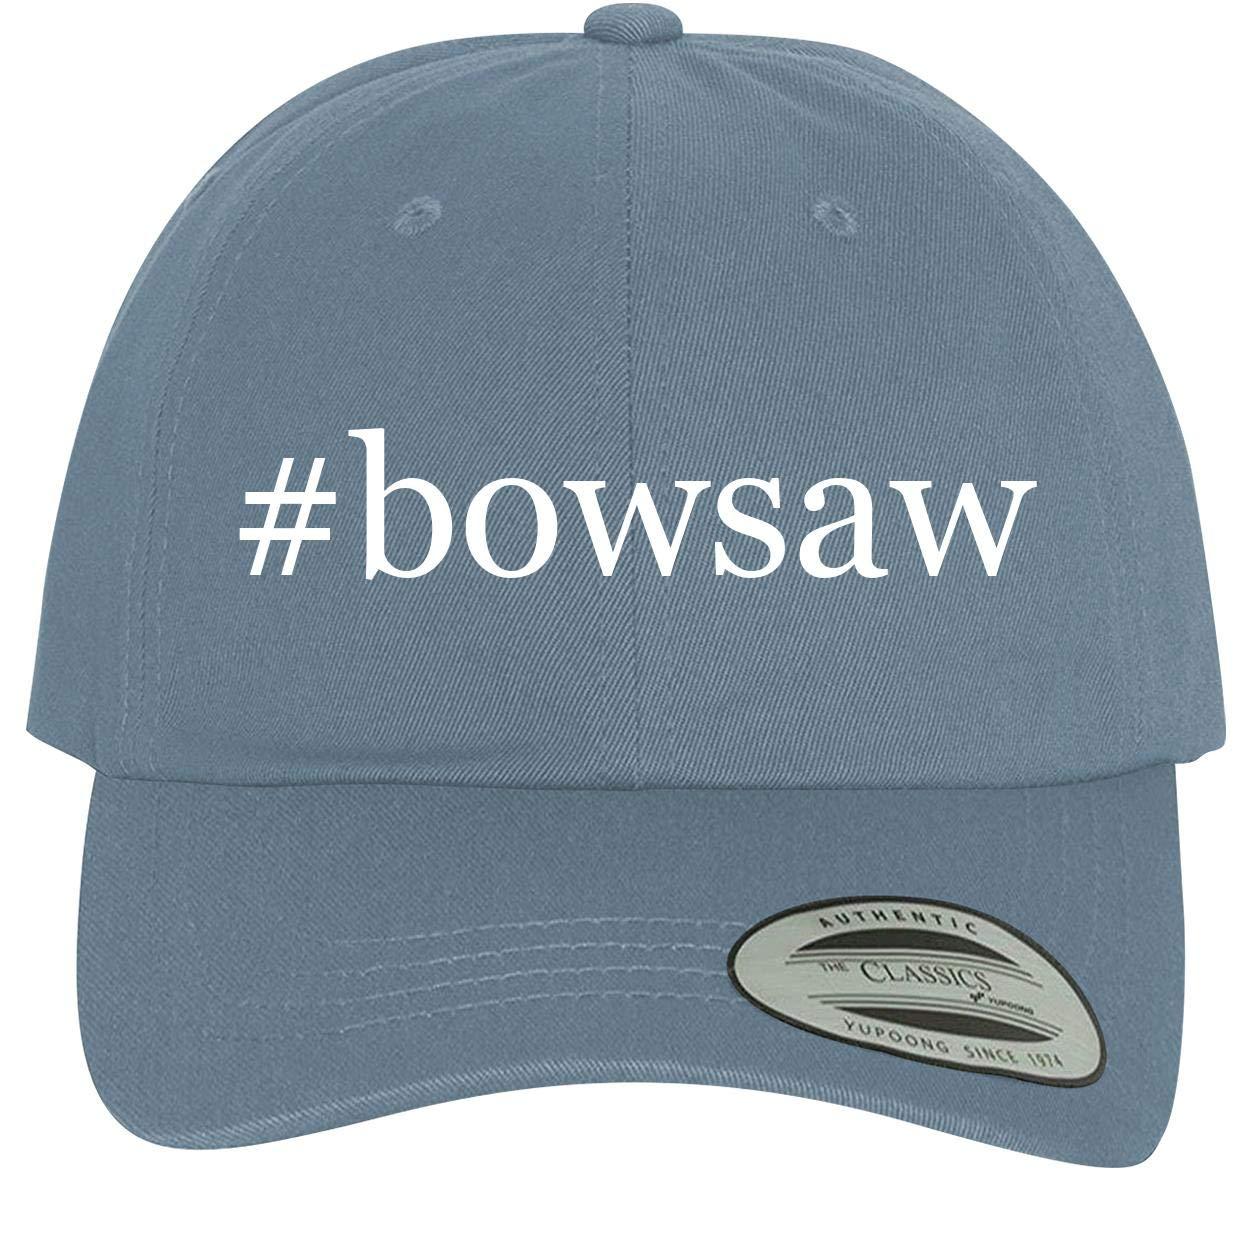 BH Cool Designs #bowsaw Comfortable Dad Hat Baseball Cap